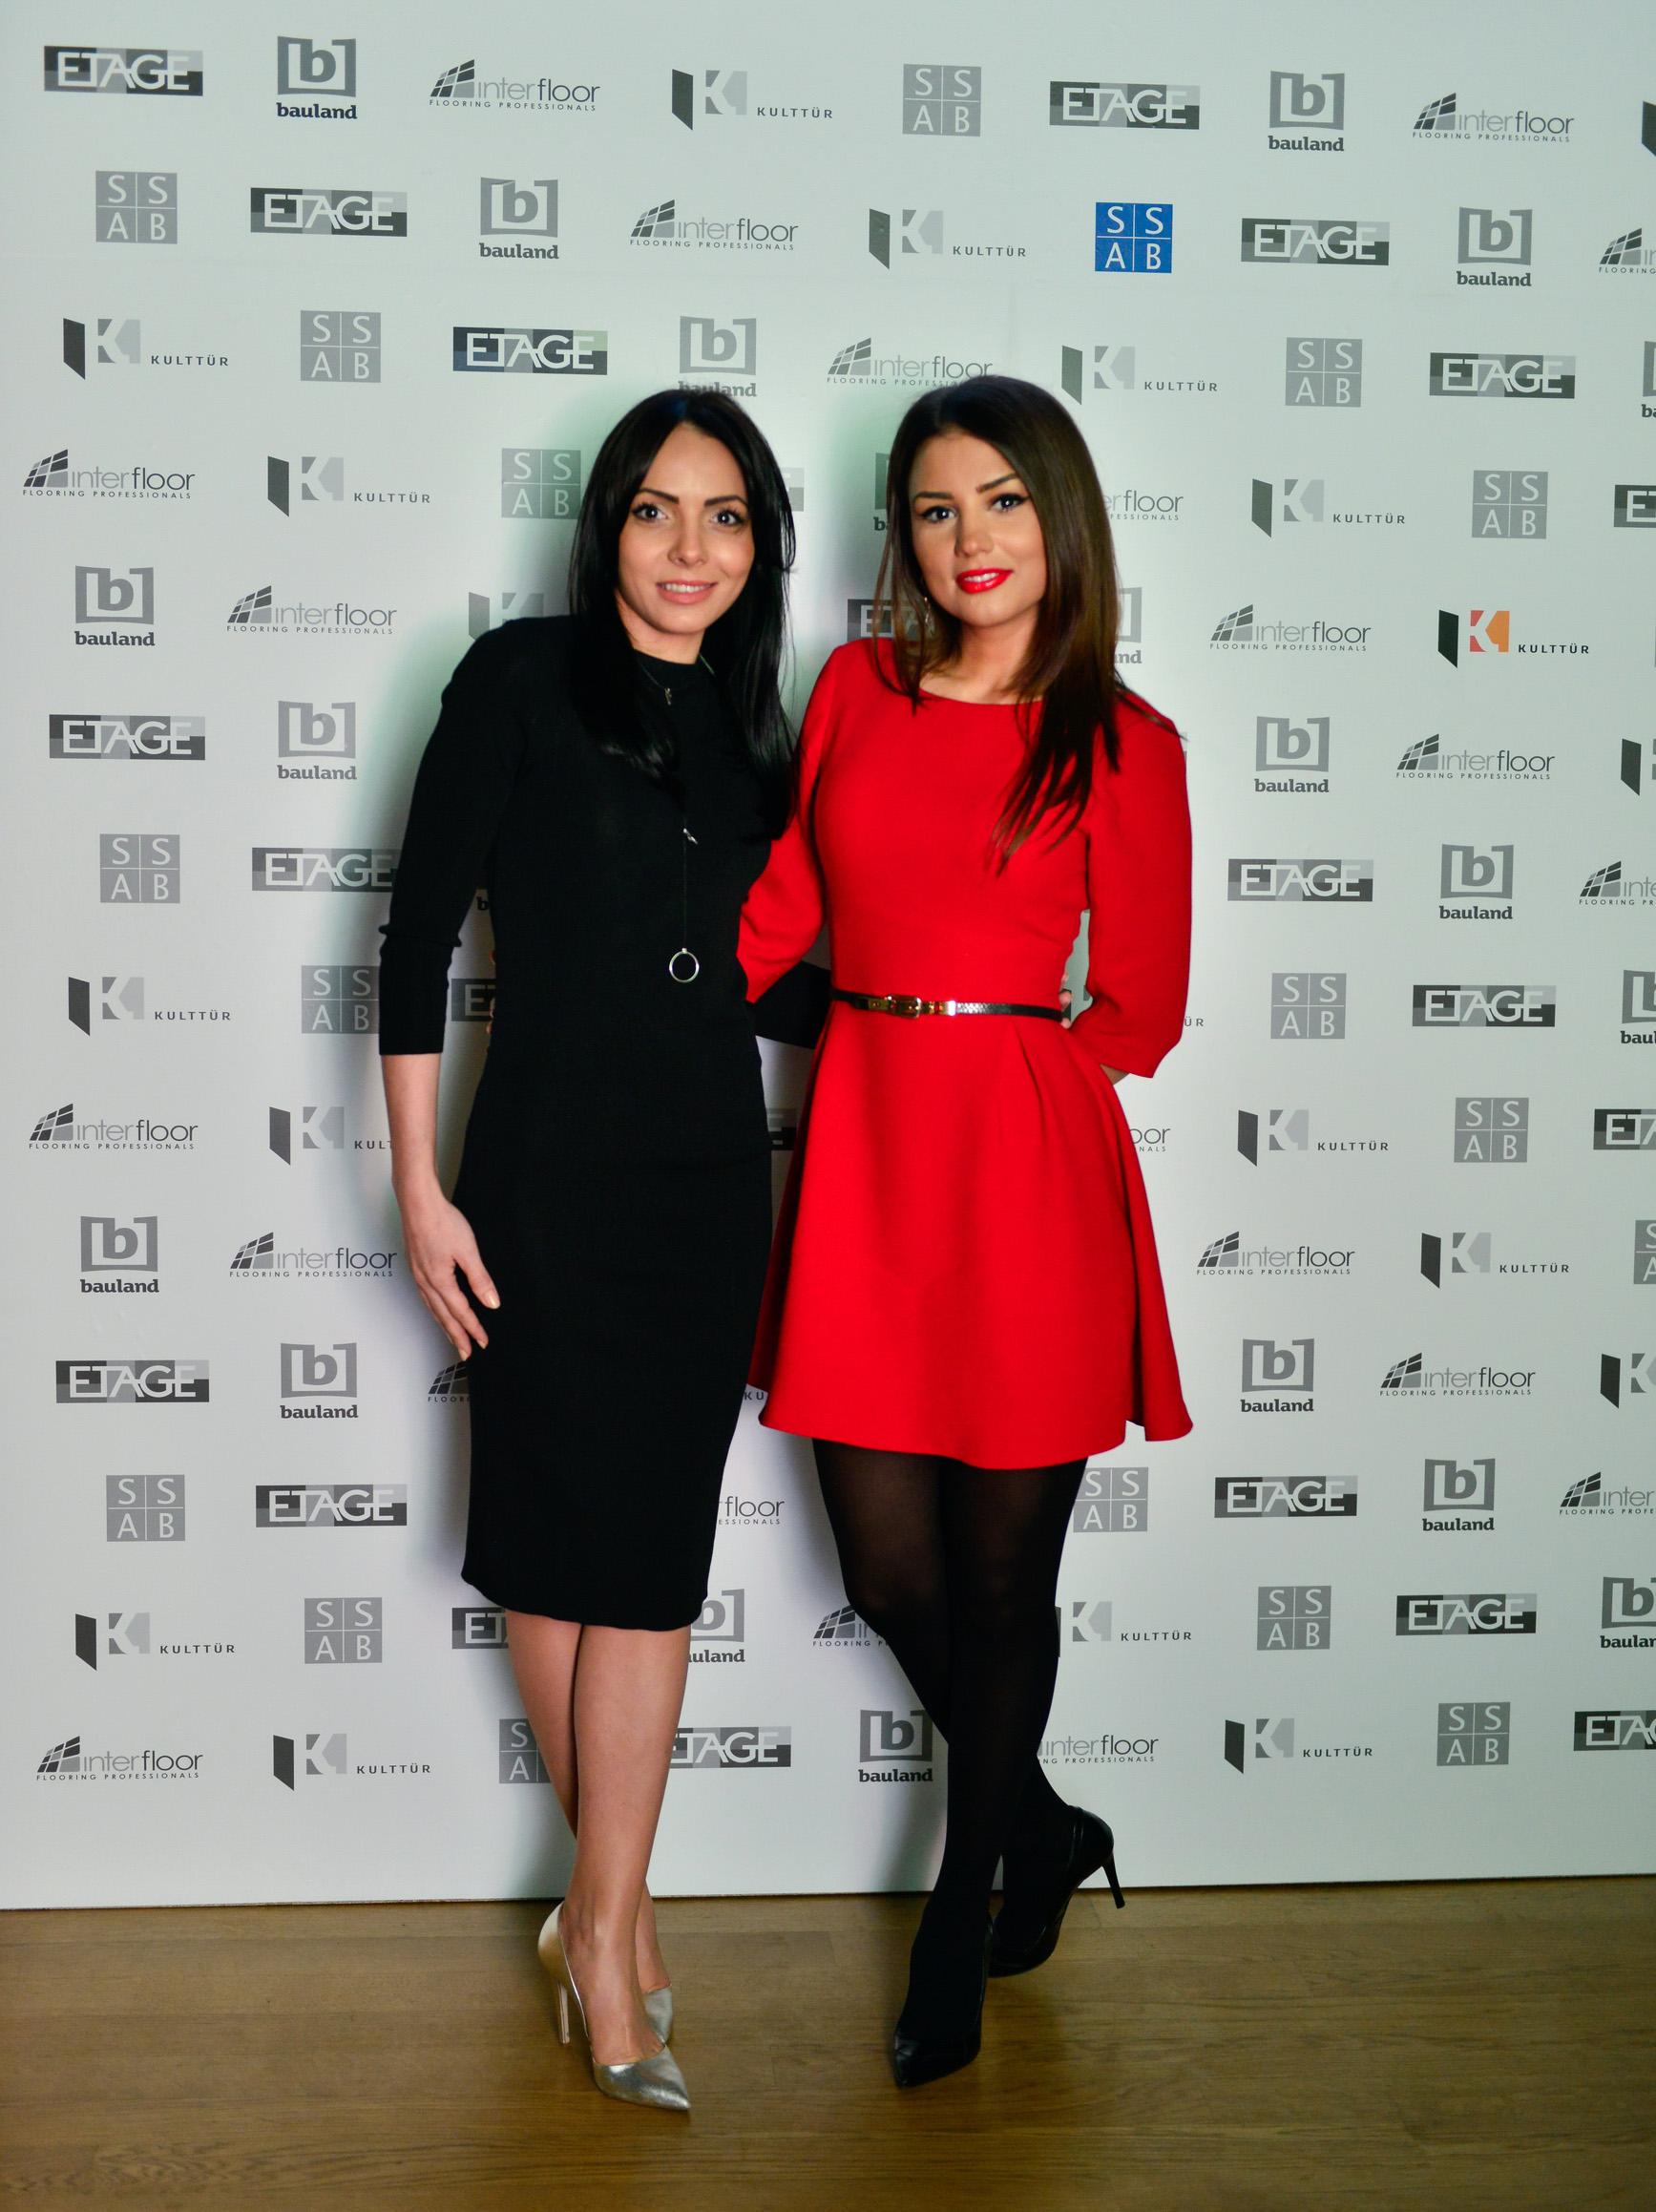 Amalia Nedelcu SSAB - Andreea Joita Antena1 - S-a deschis Showroom-ul ETAGE din strada Nerva Traian